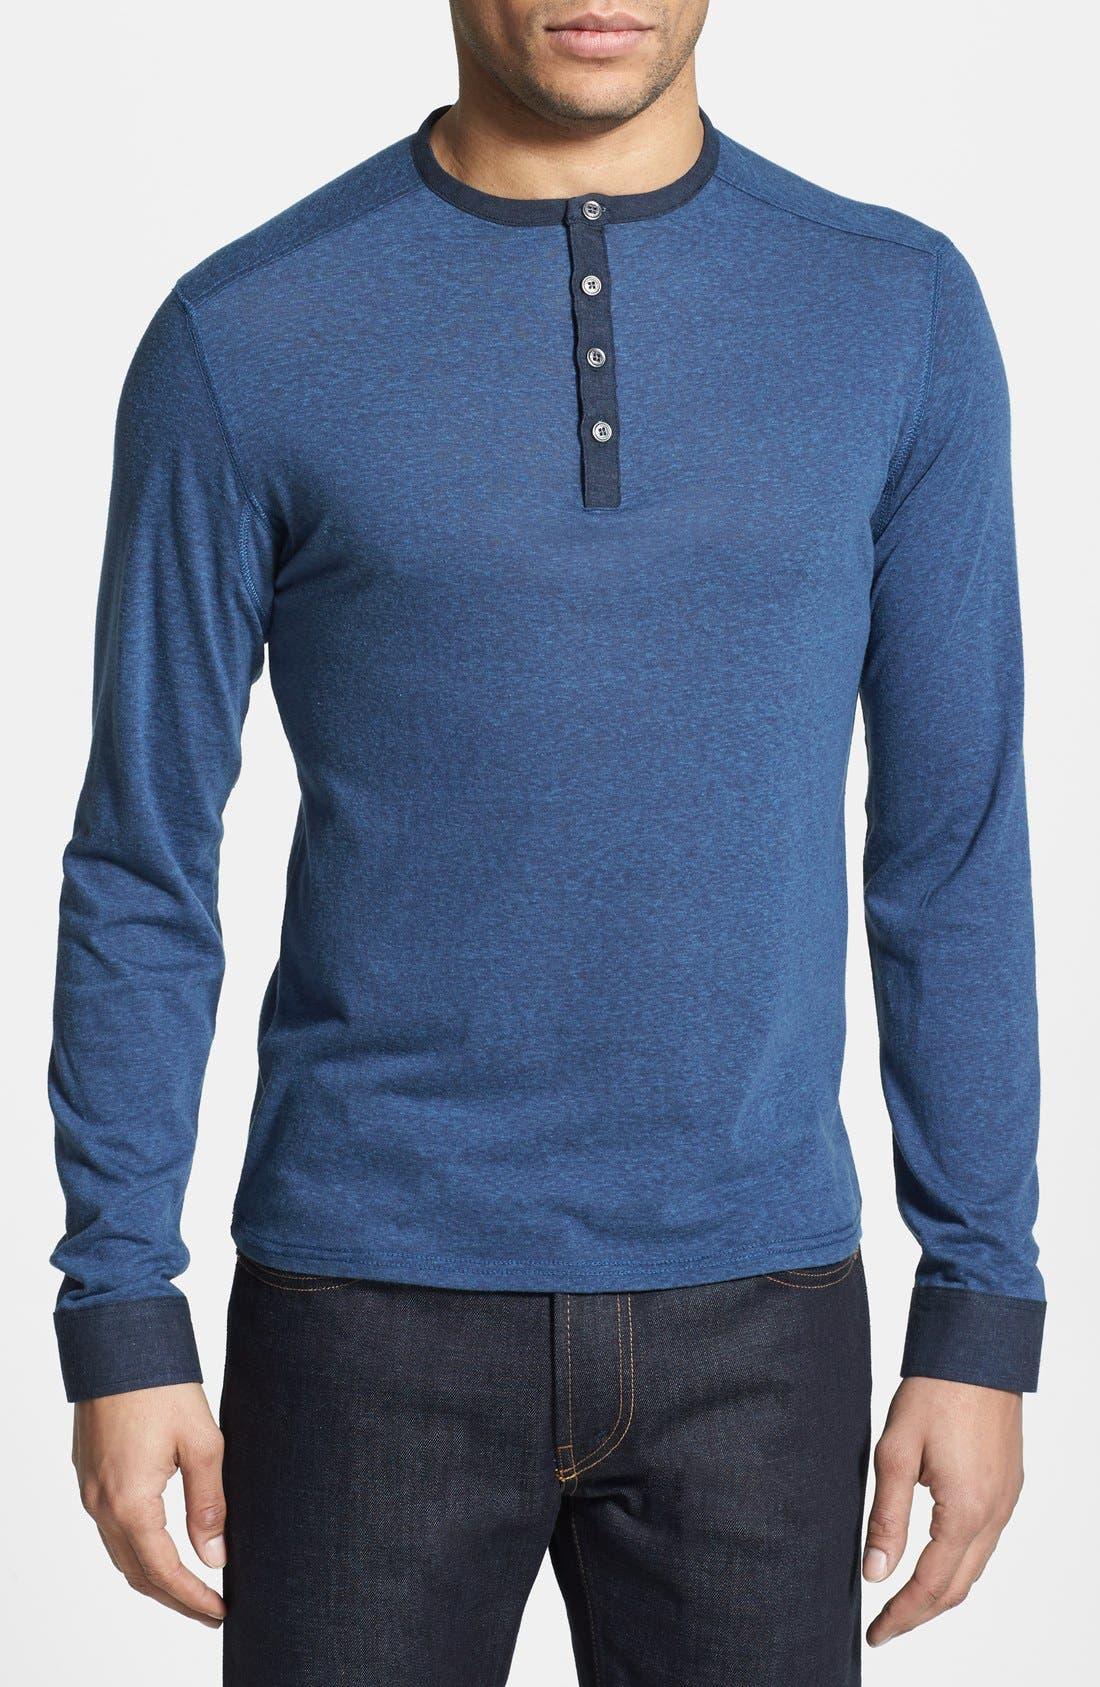 Alternate Image 1 Selected - Vince Camuto Slim Fit Knit Henley